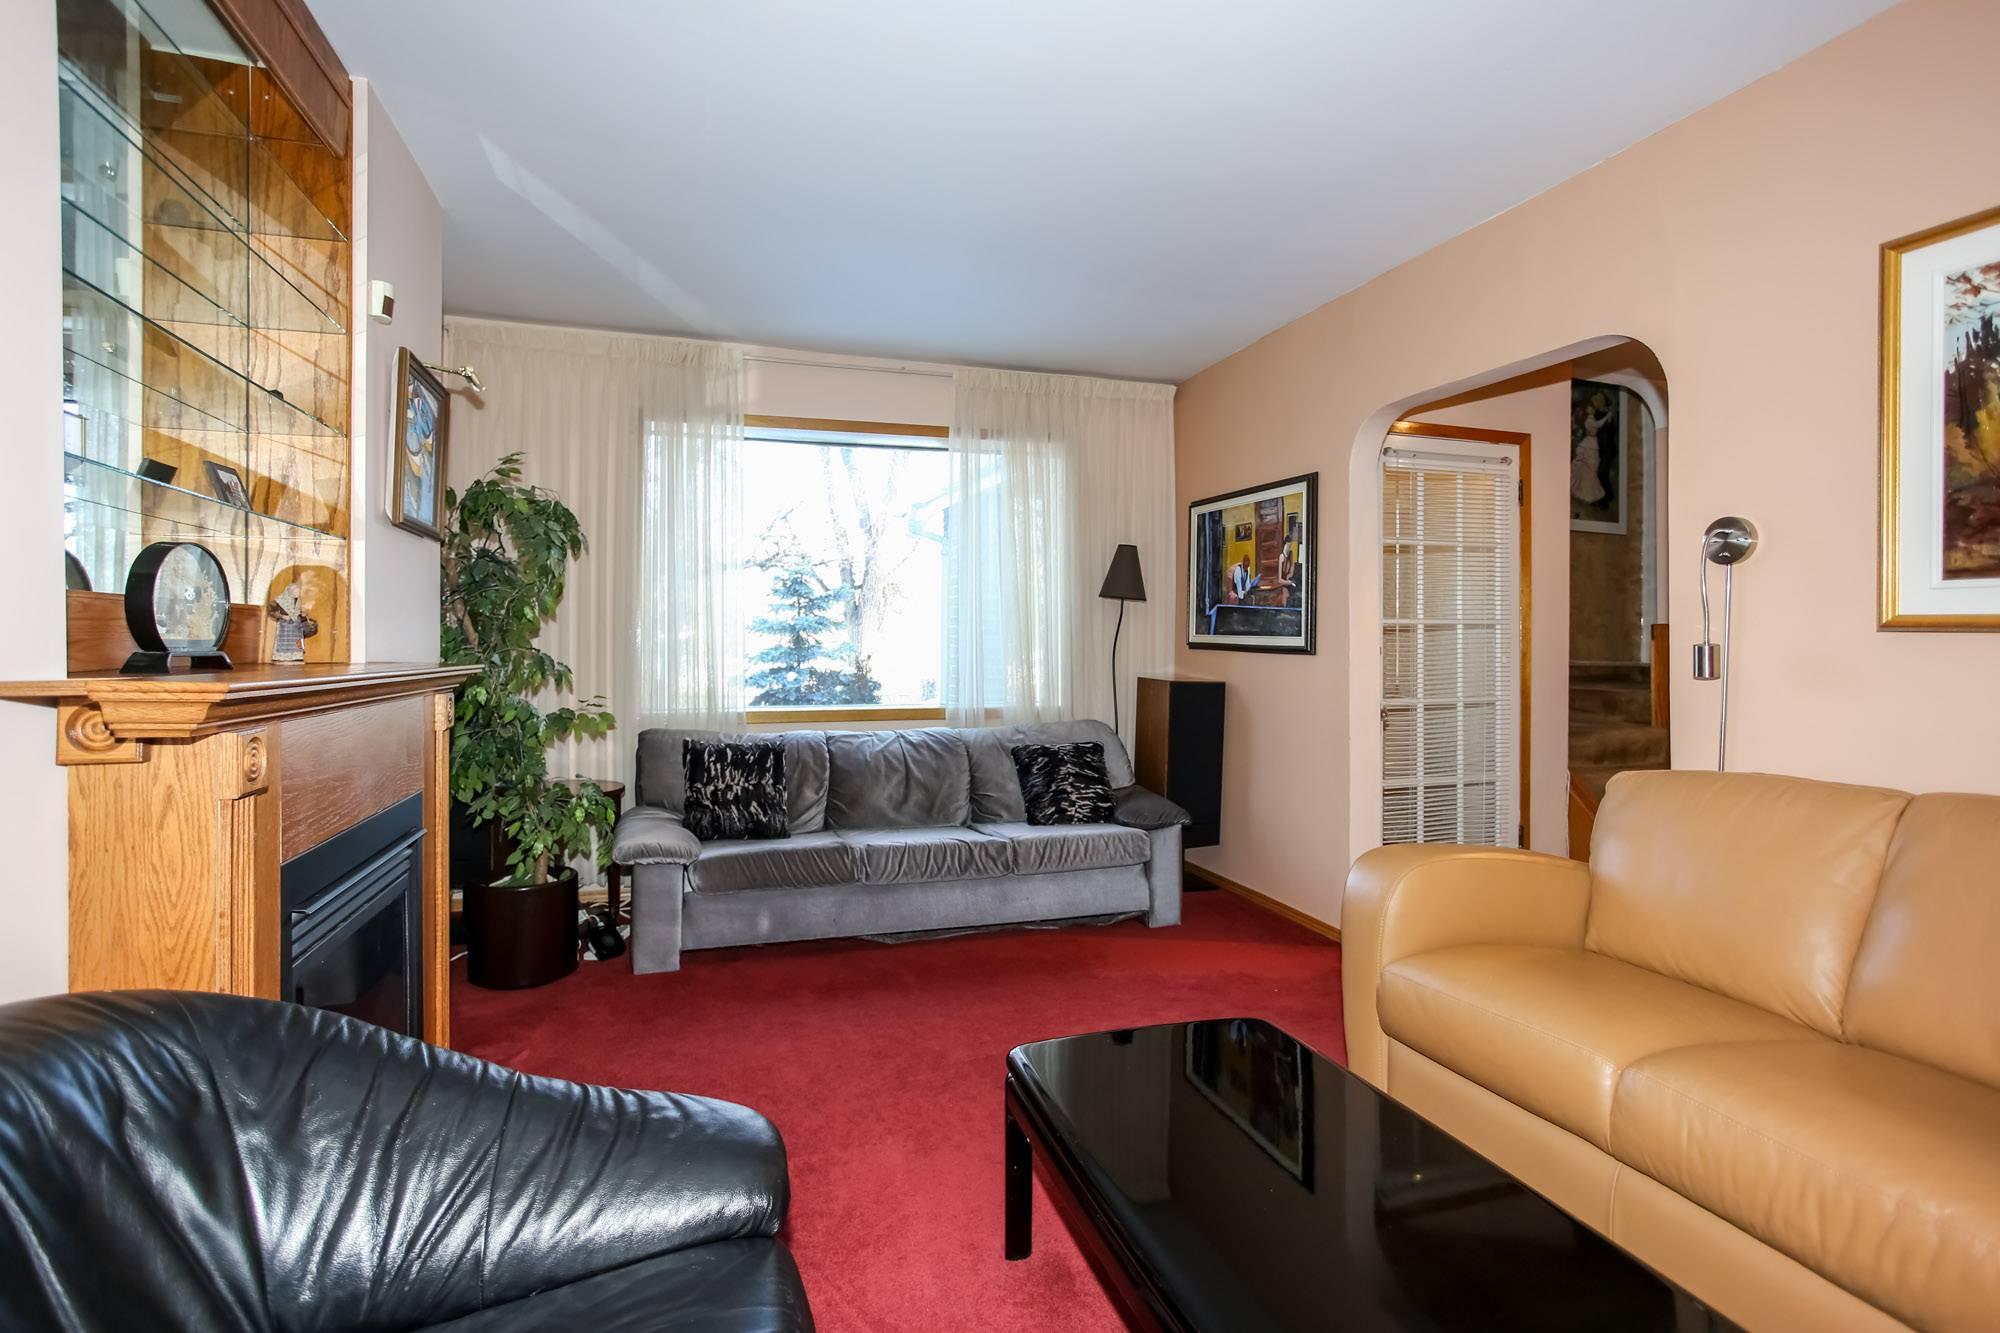 646 Academy Rd, Winnipeg, Manitoba  R3N 0E9 - Photo 8 - 1905554